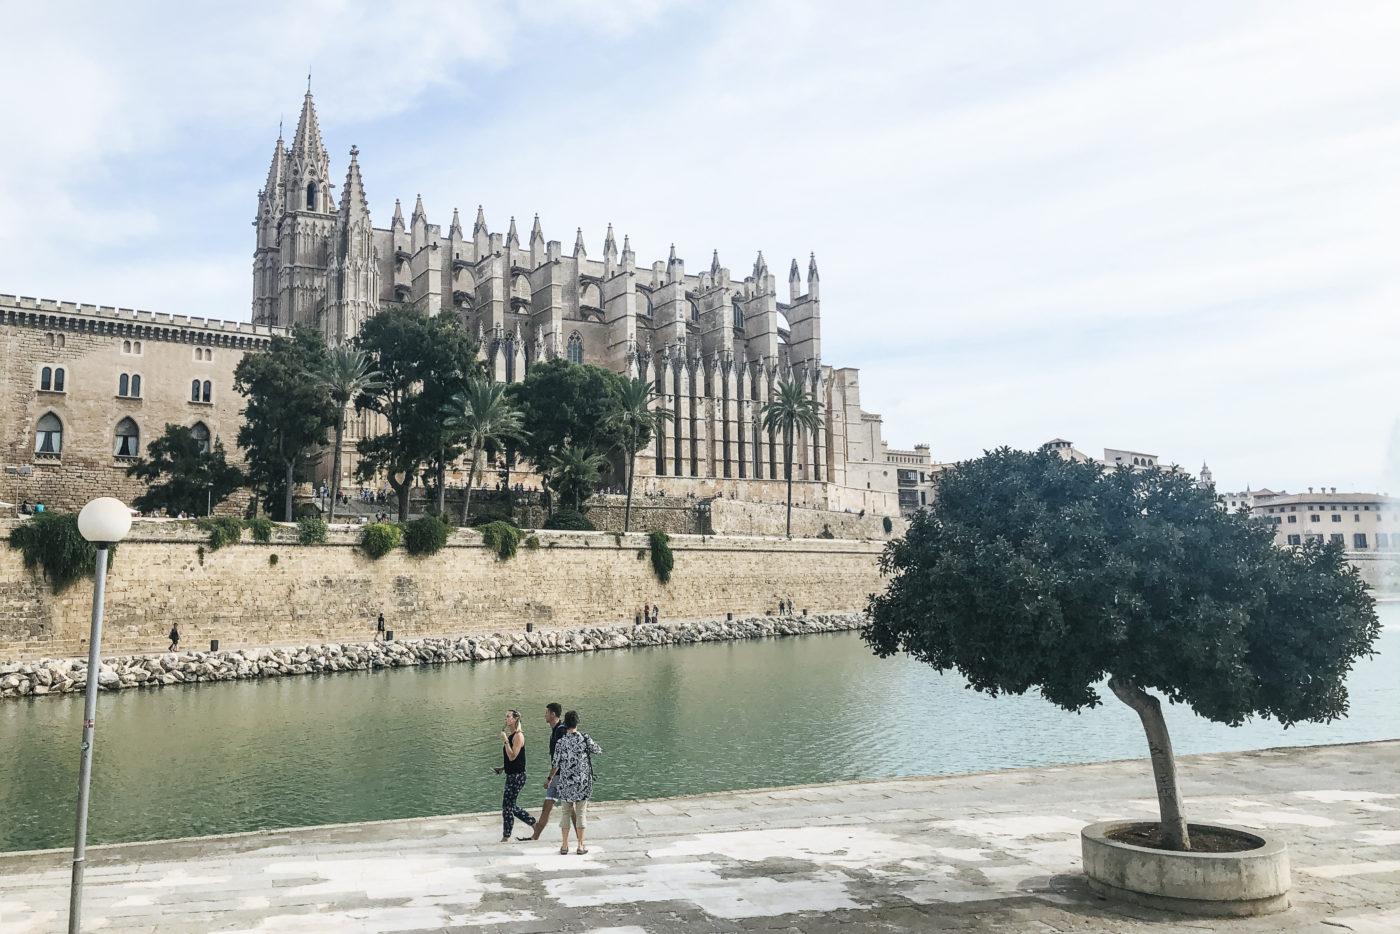 agence evenementielle receptive pays basque erronda seminaire team building incentive event baléares Majorque Mallorca réunion visite culturelle